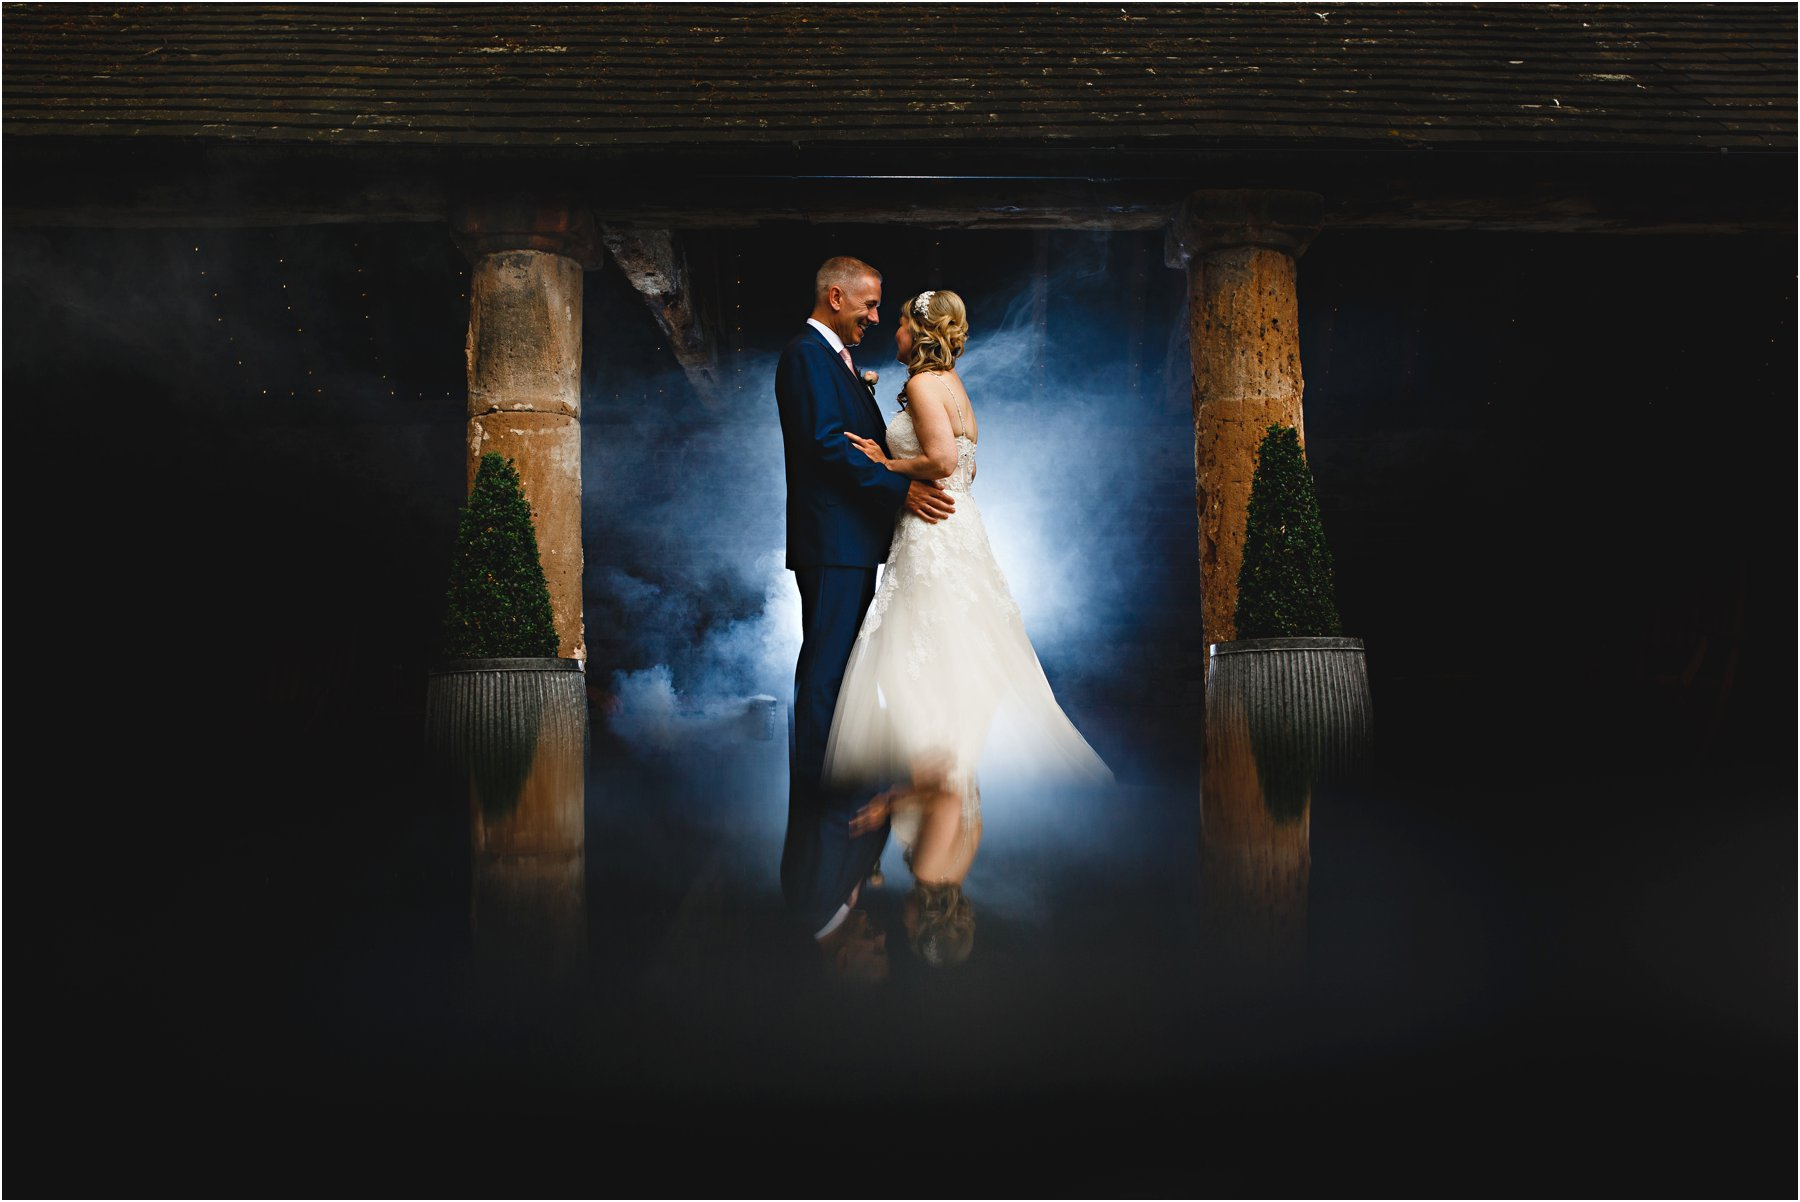 The bride and groom at Shustoke Farm Barn